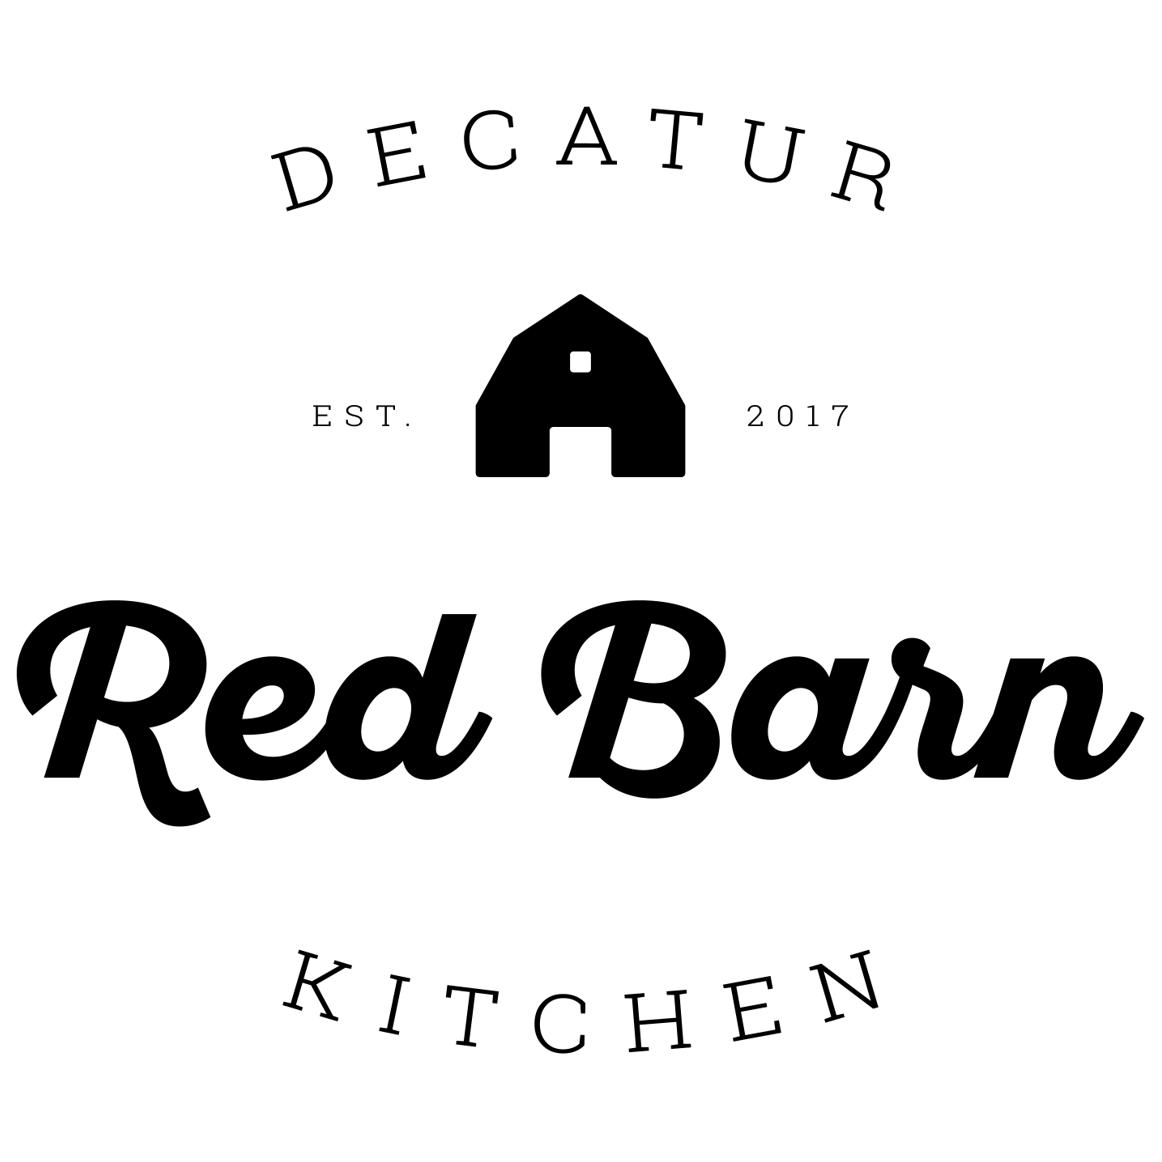 Red Barn Kitchen image 6